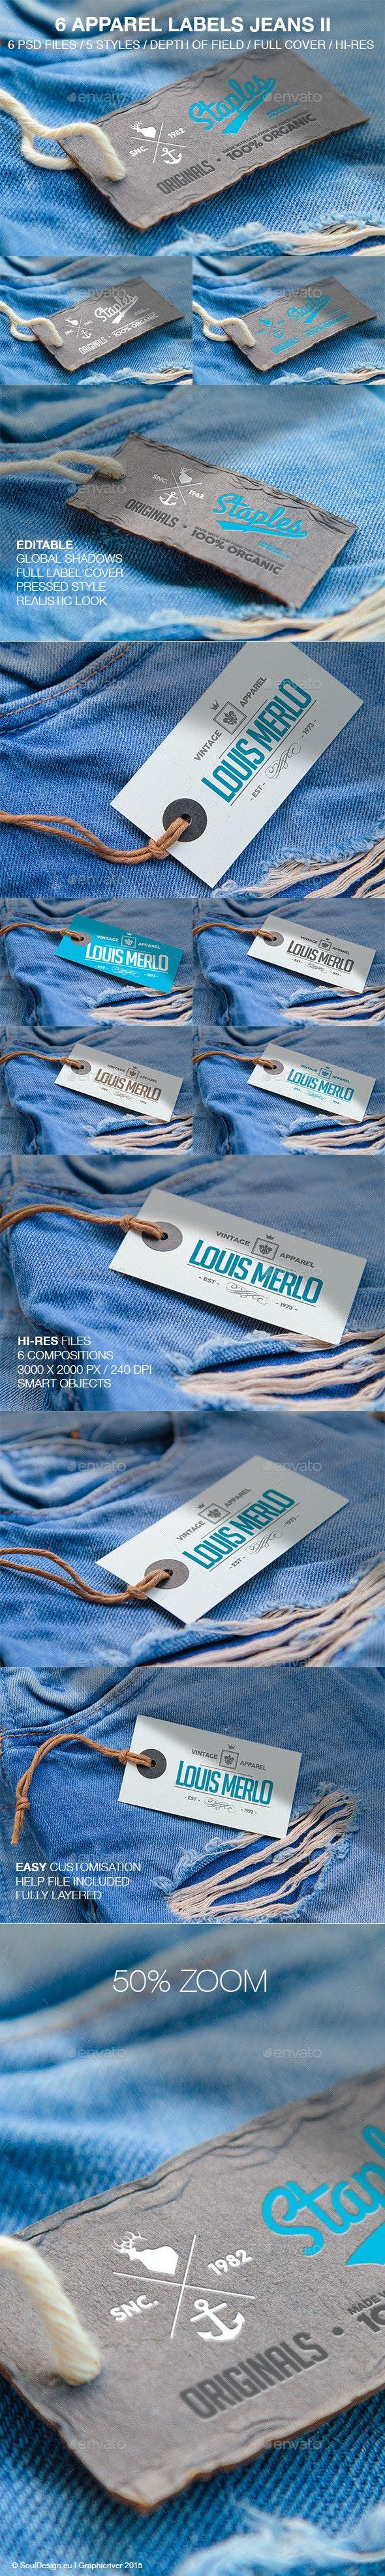 6 Apparel Labels Jeans II - Logo Product Mock-Ups